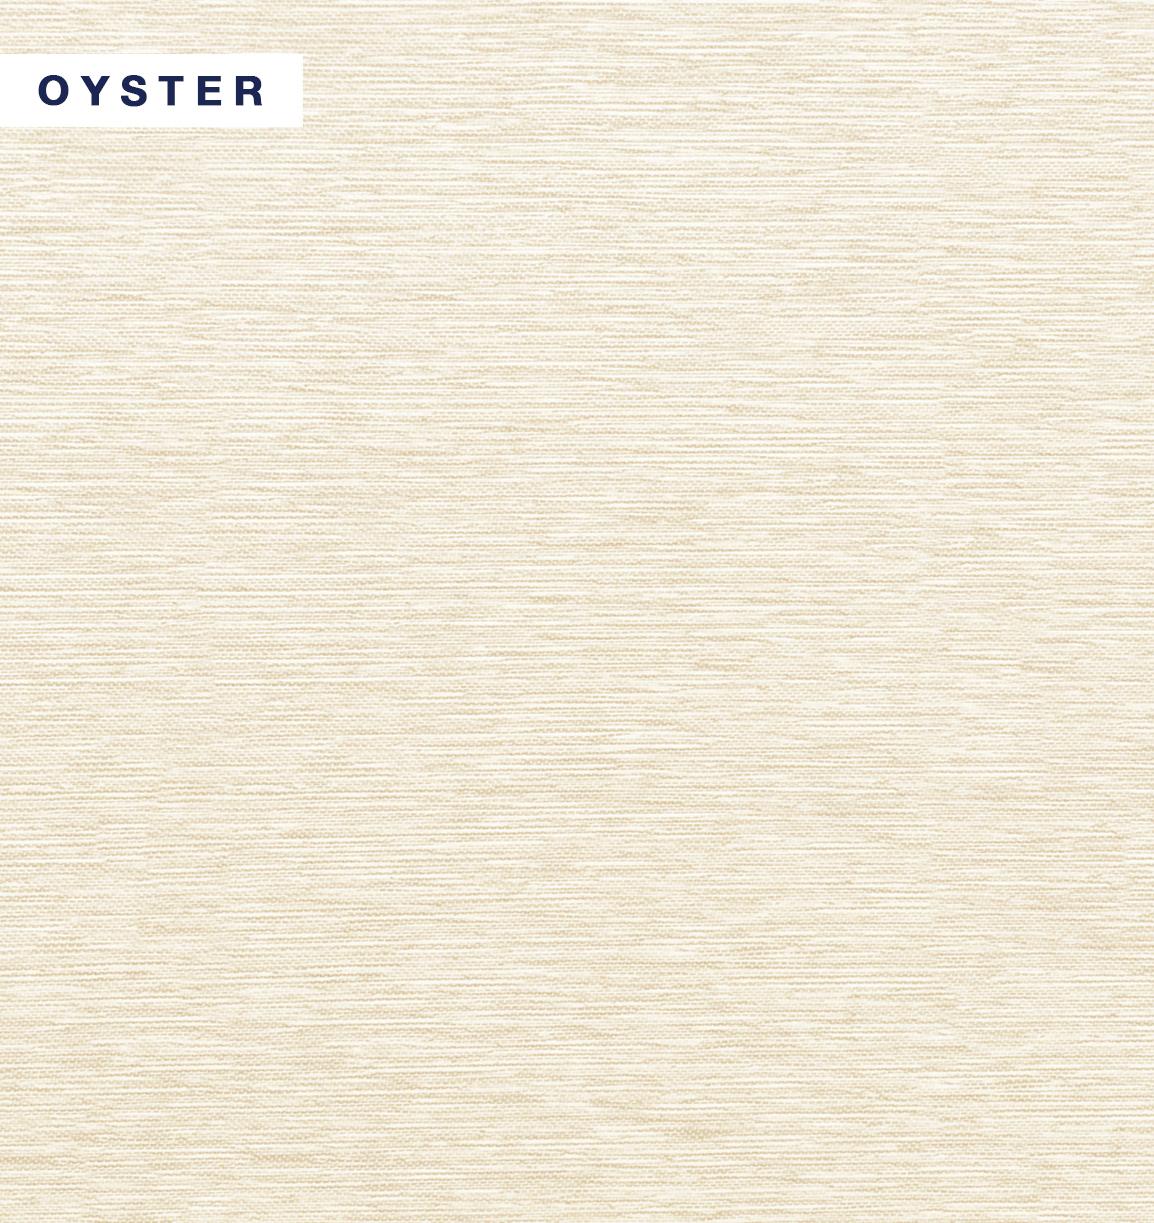 Zara - Oyster.jpg